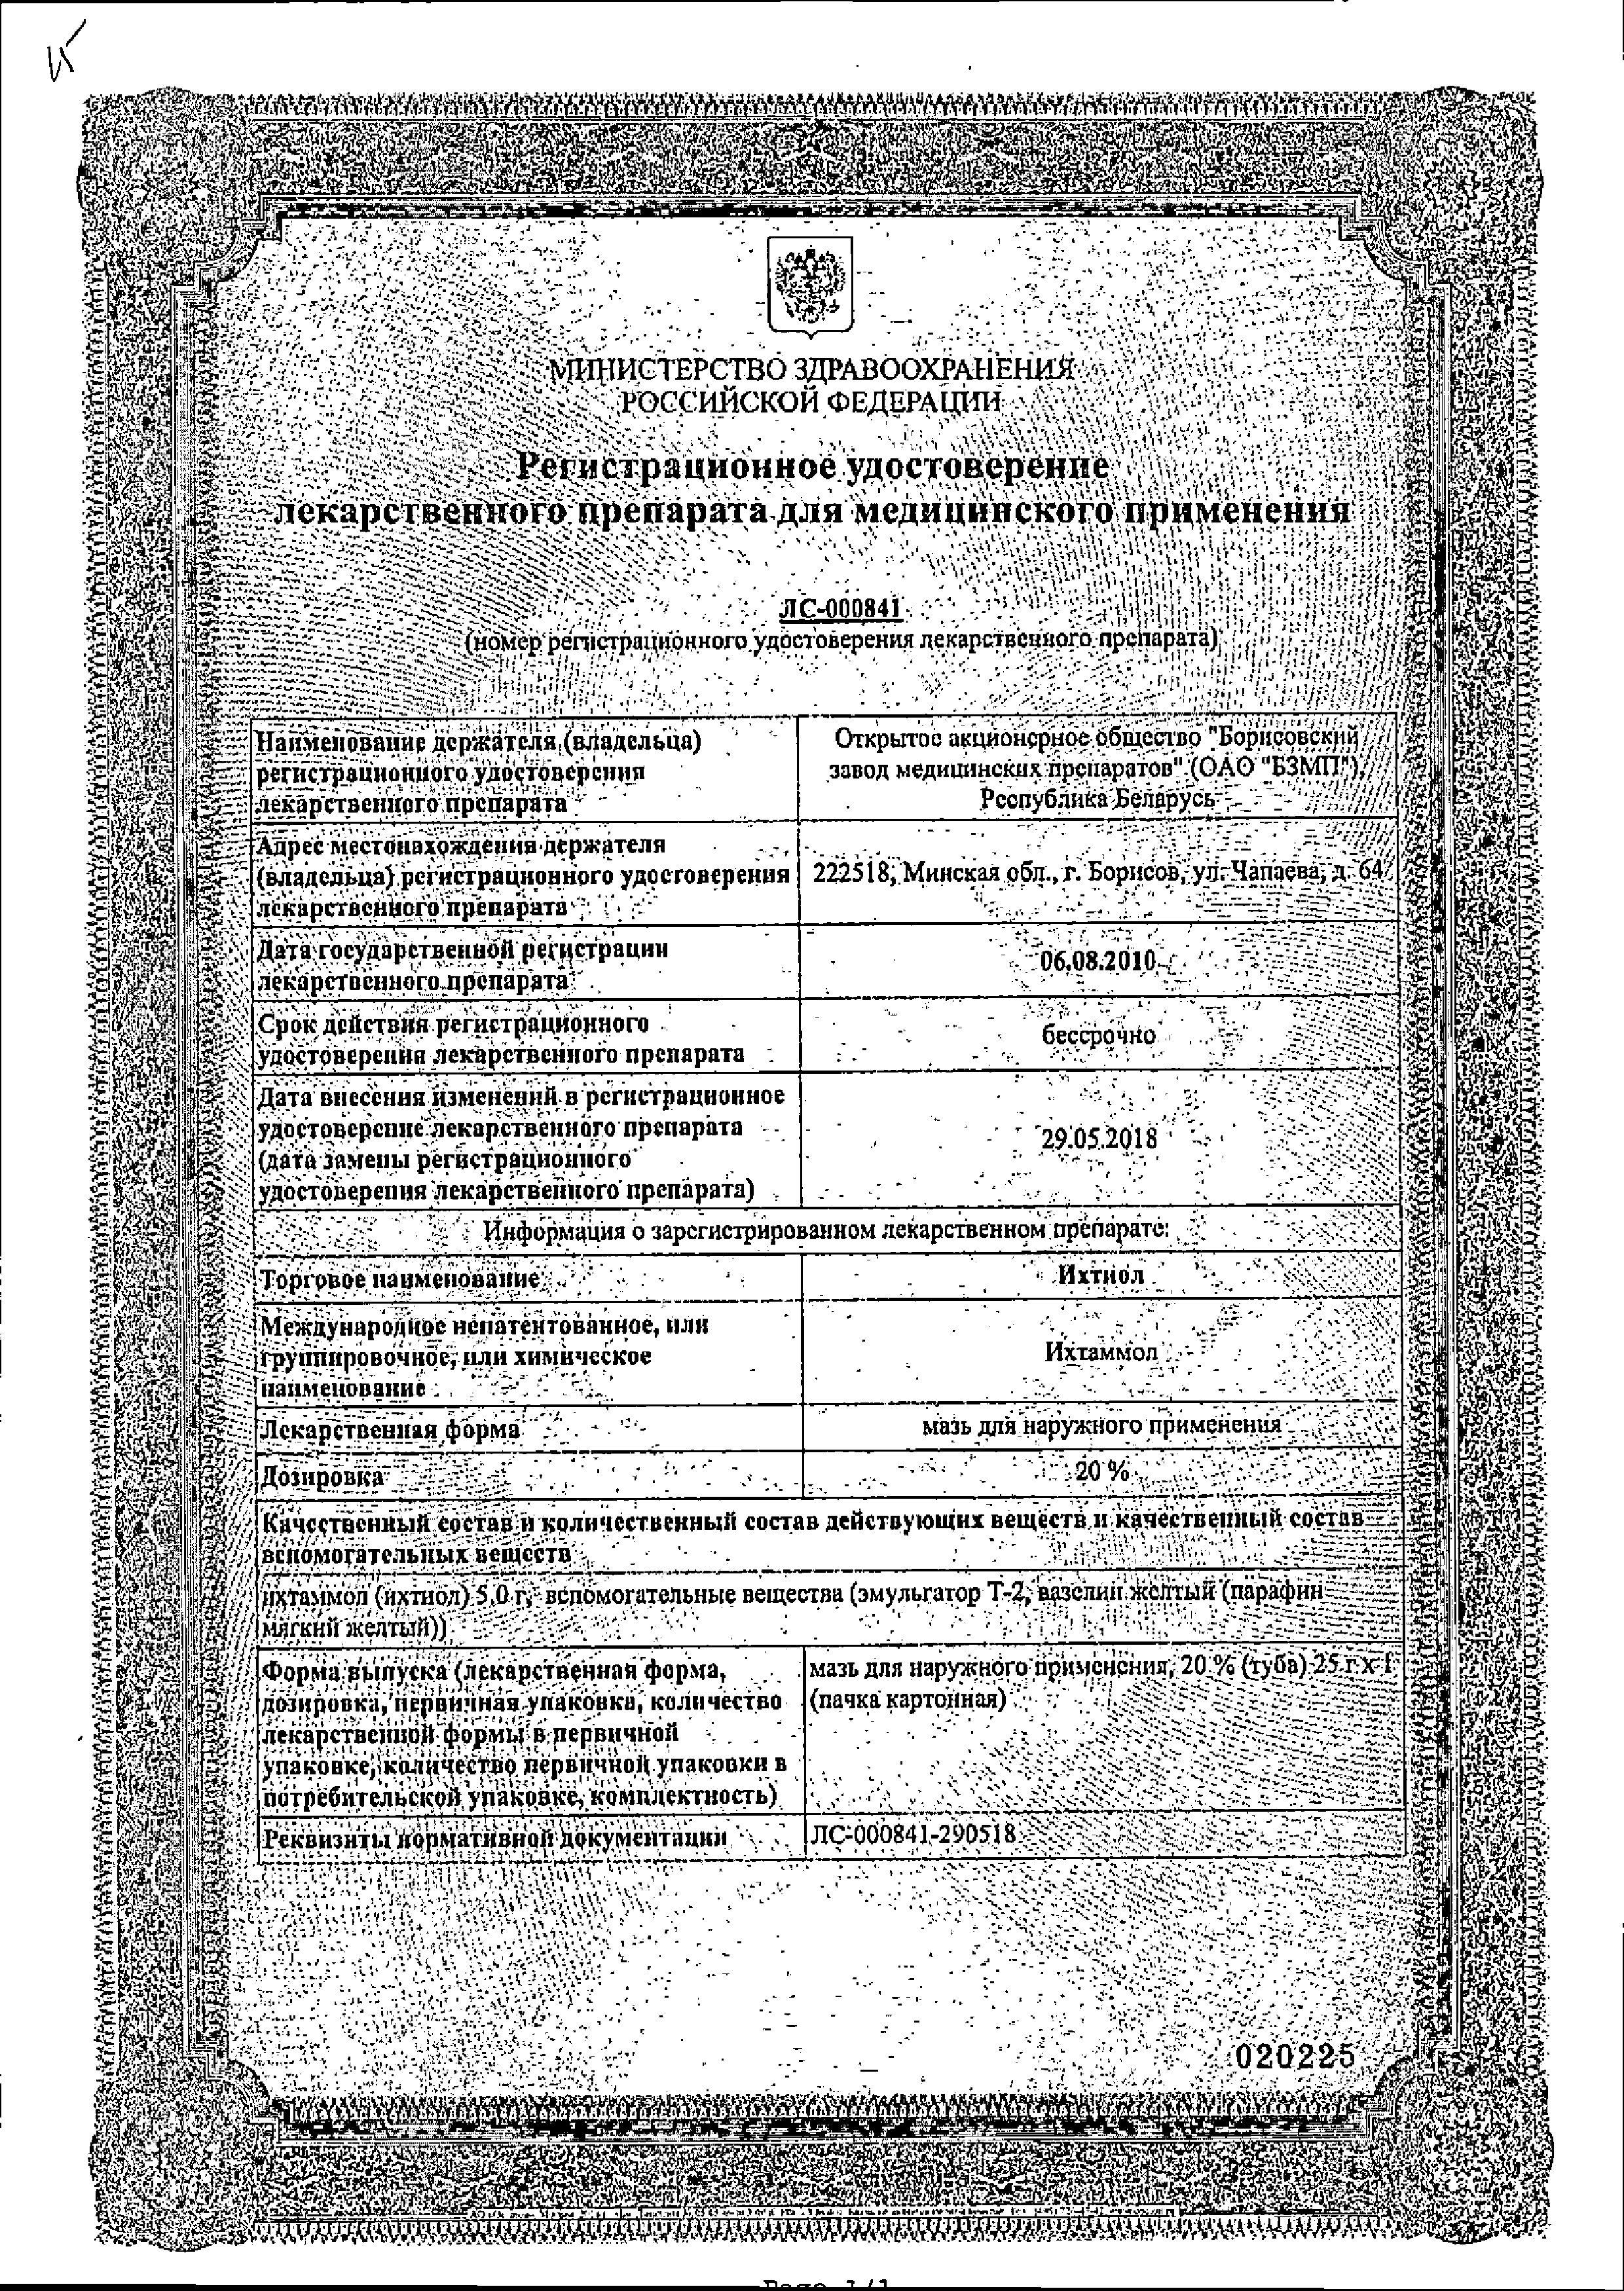 Ихтиол сертификат